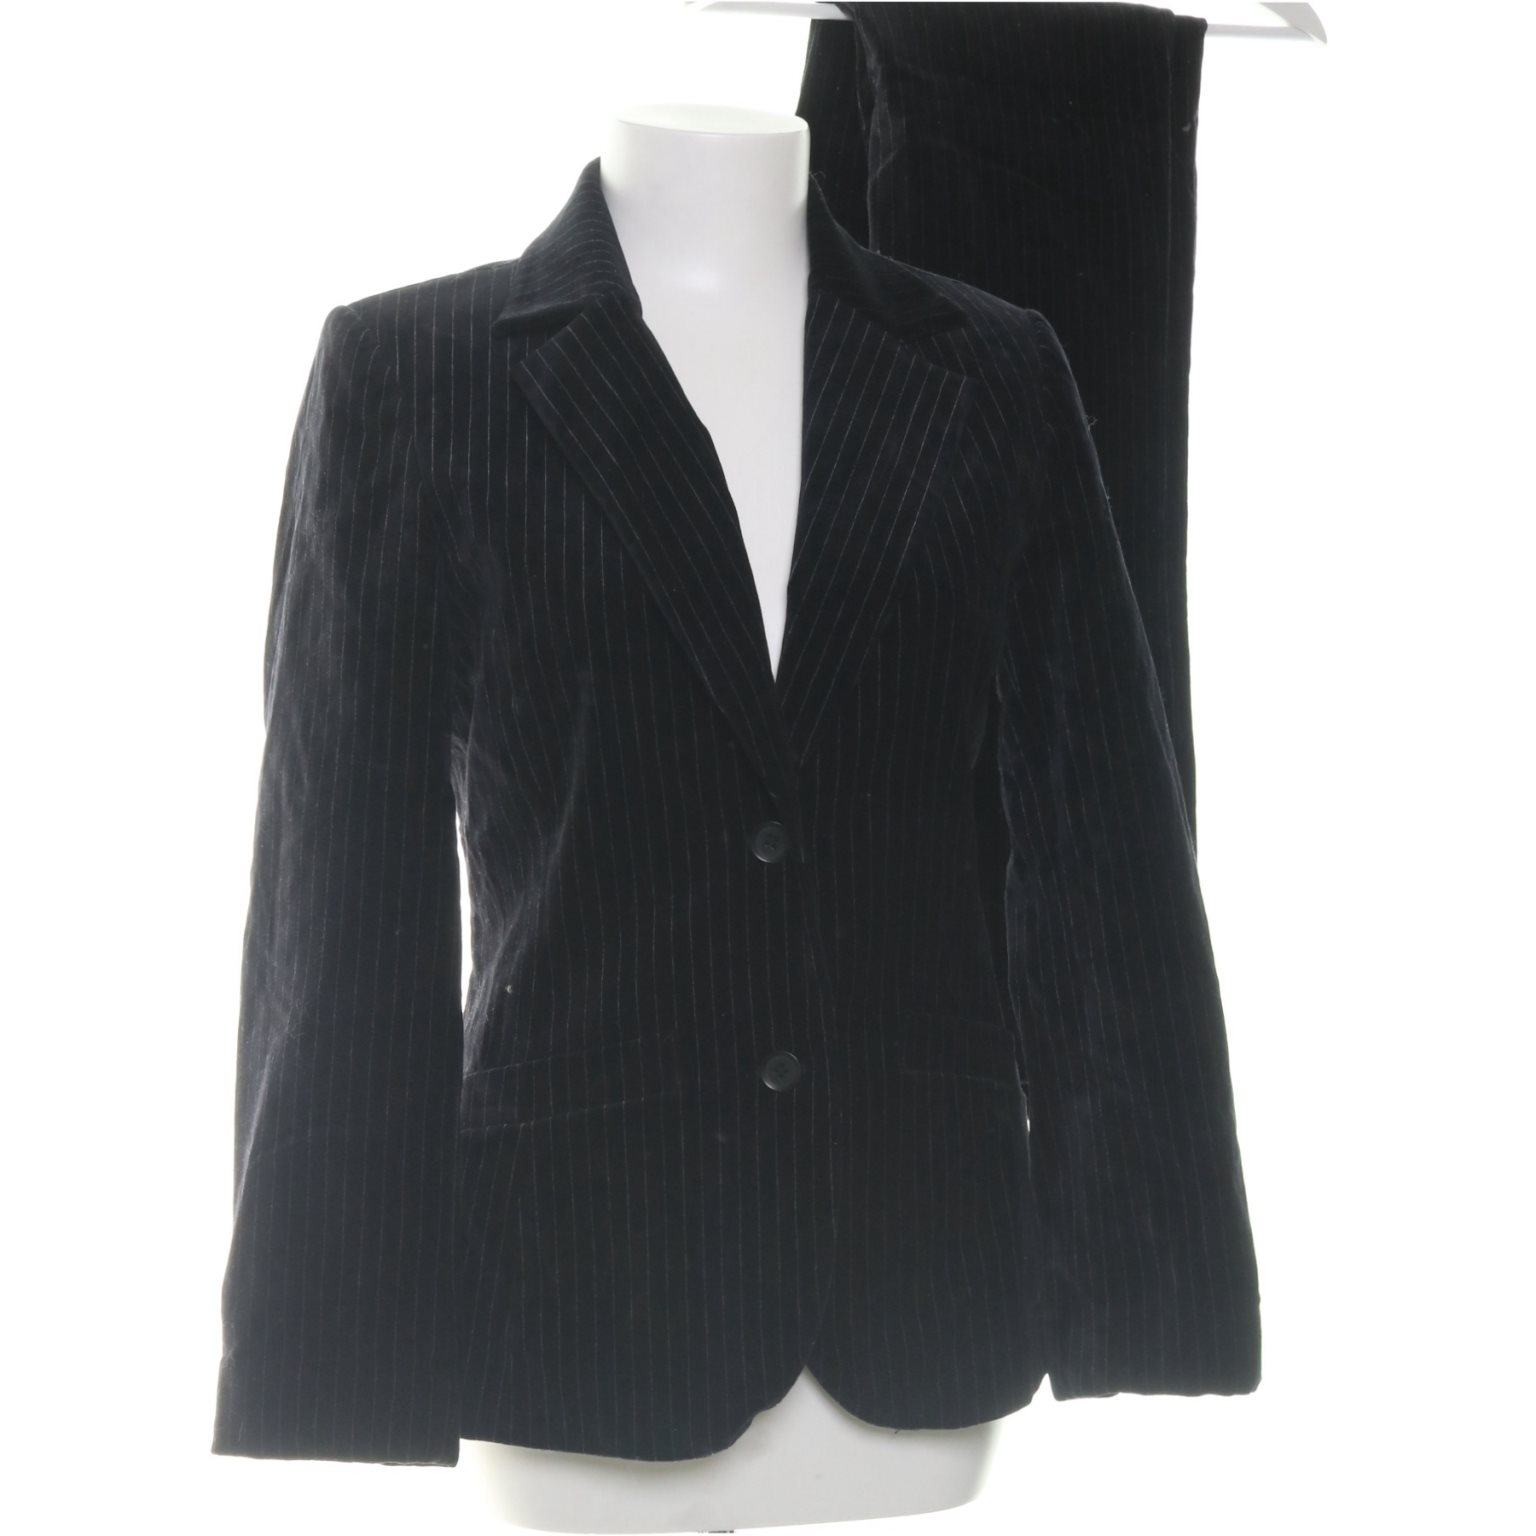 H&M, Kostym, Strl: Strl: Strl: 38, Svart 416dae